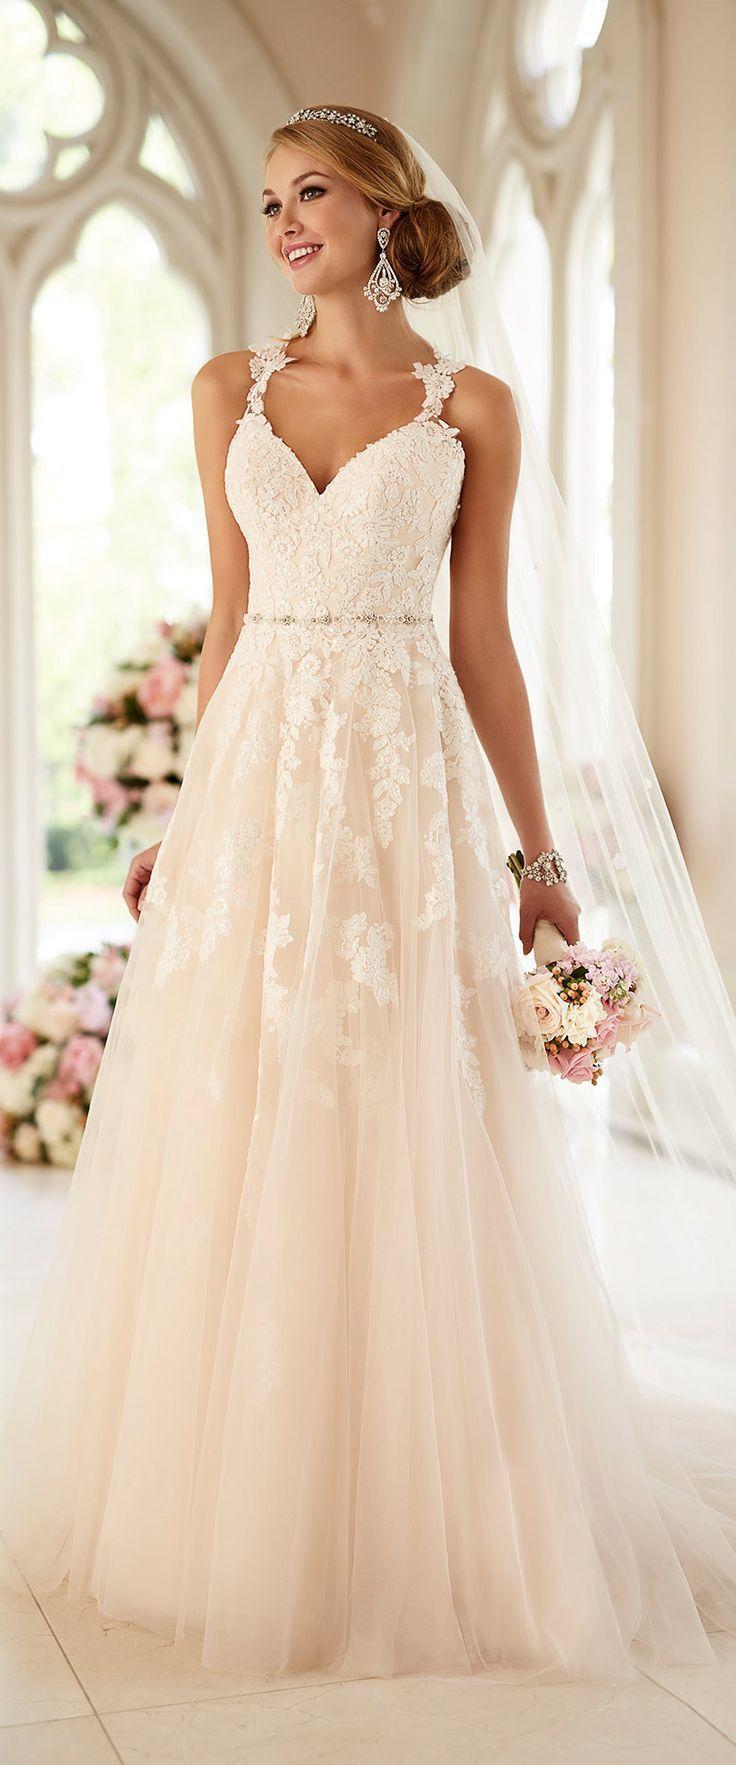 Fairness wedding dresses designer with sleeves zuhair murad